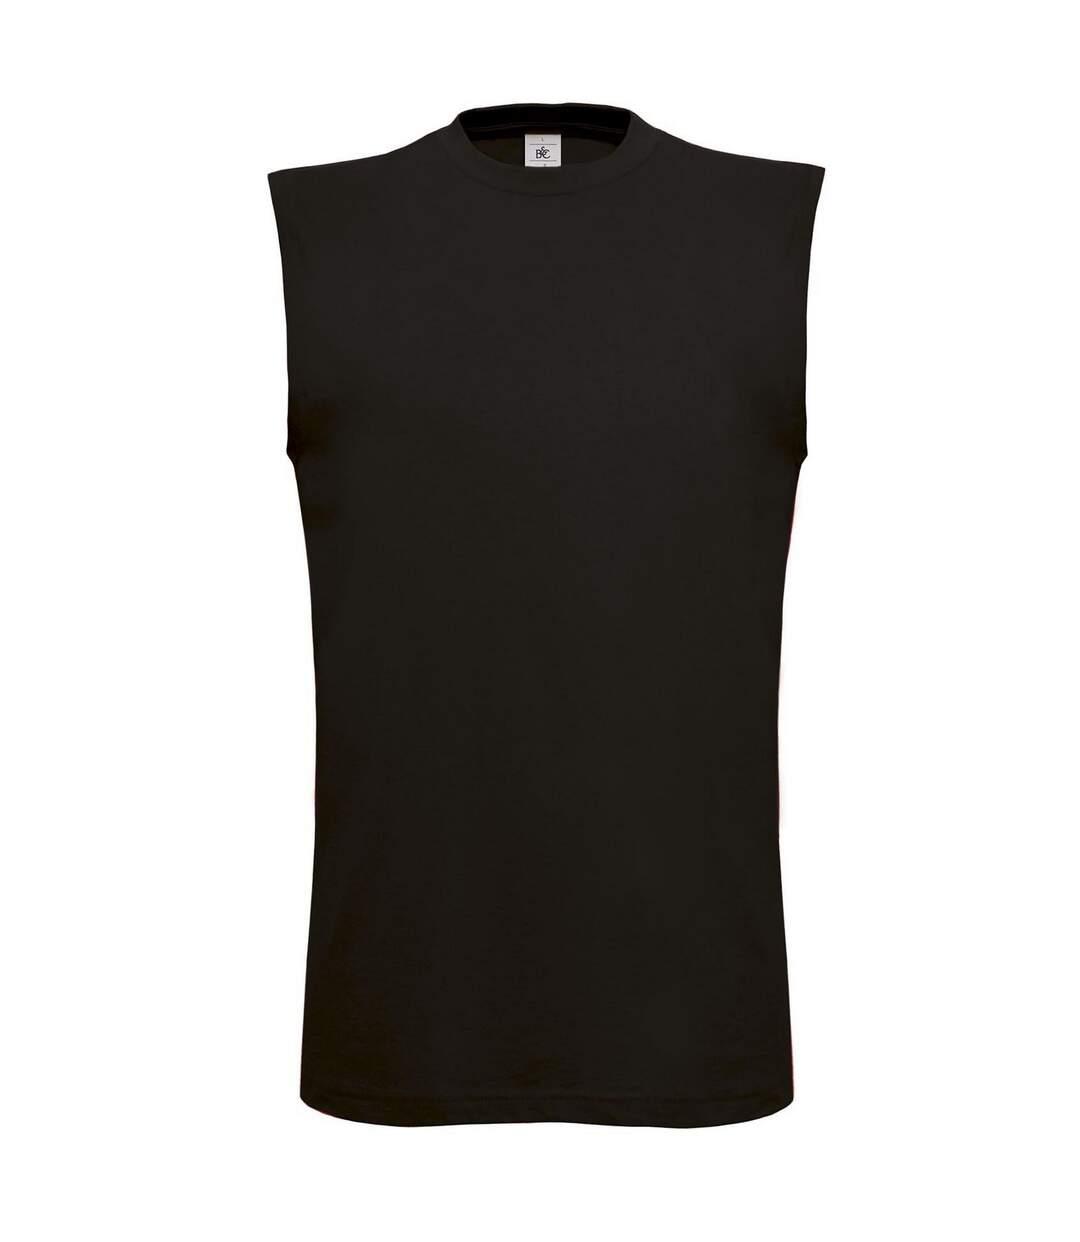 B&C Mens Exact Move Athletic Sleeveless Sports Vest Top (Sport Grey) - UTRW3502